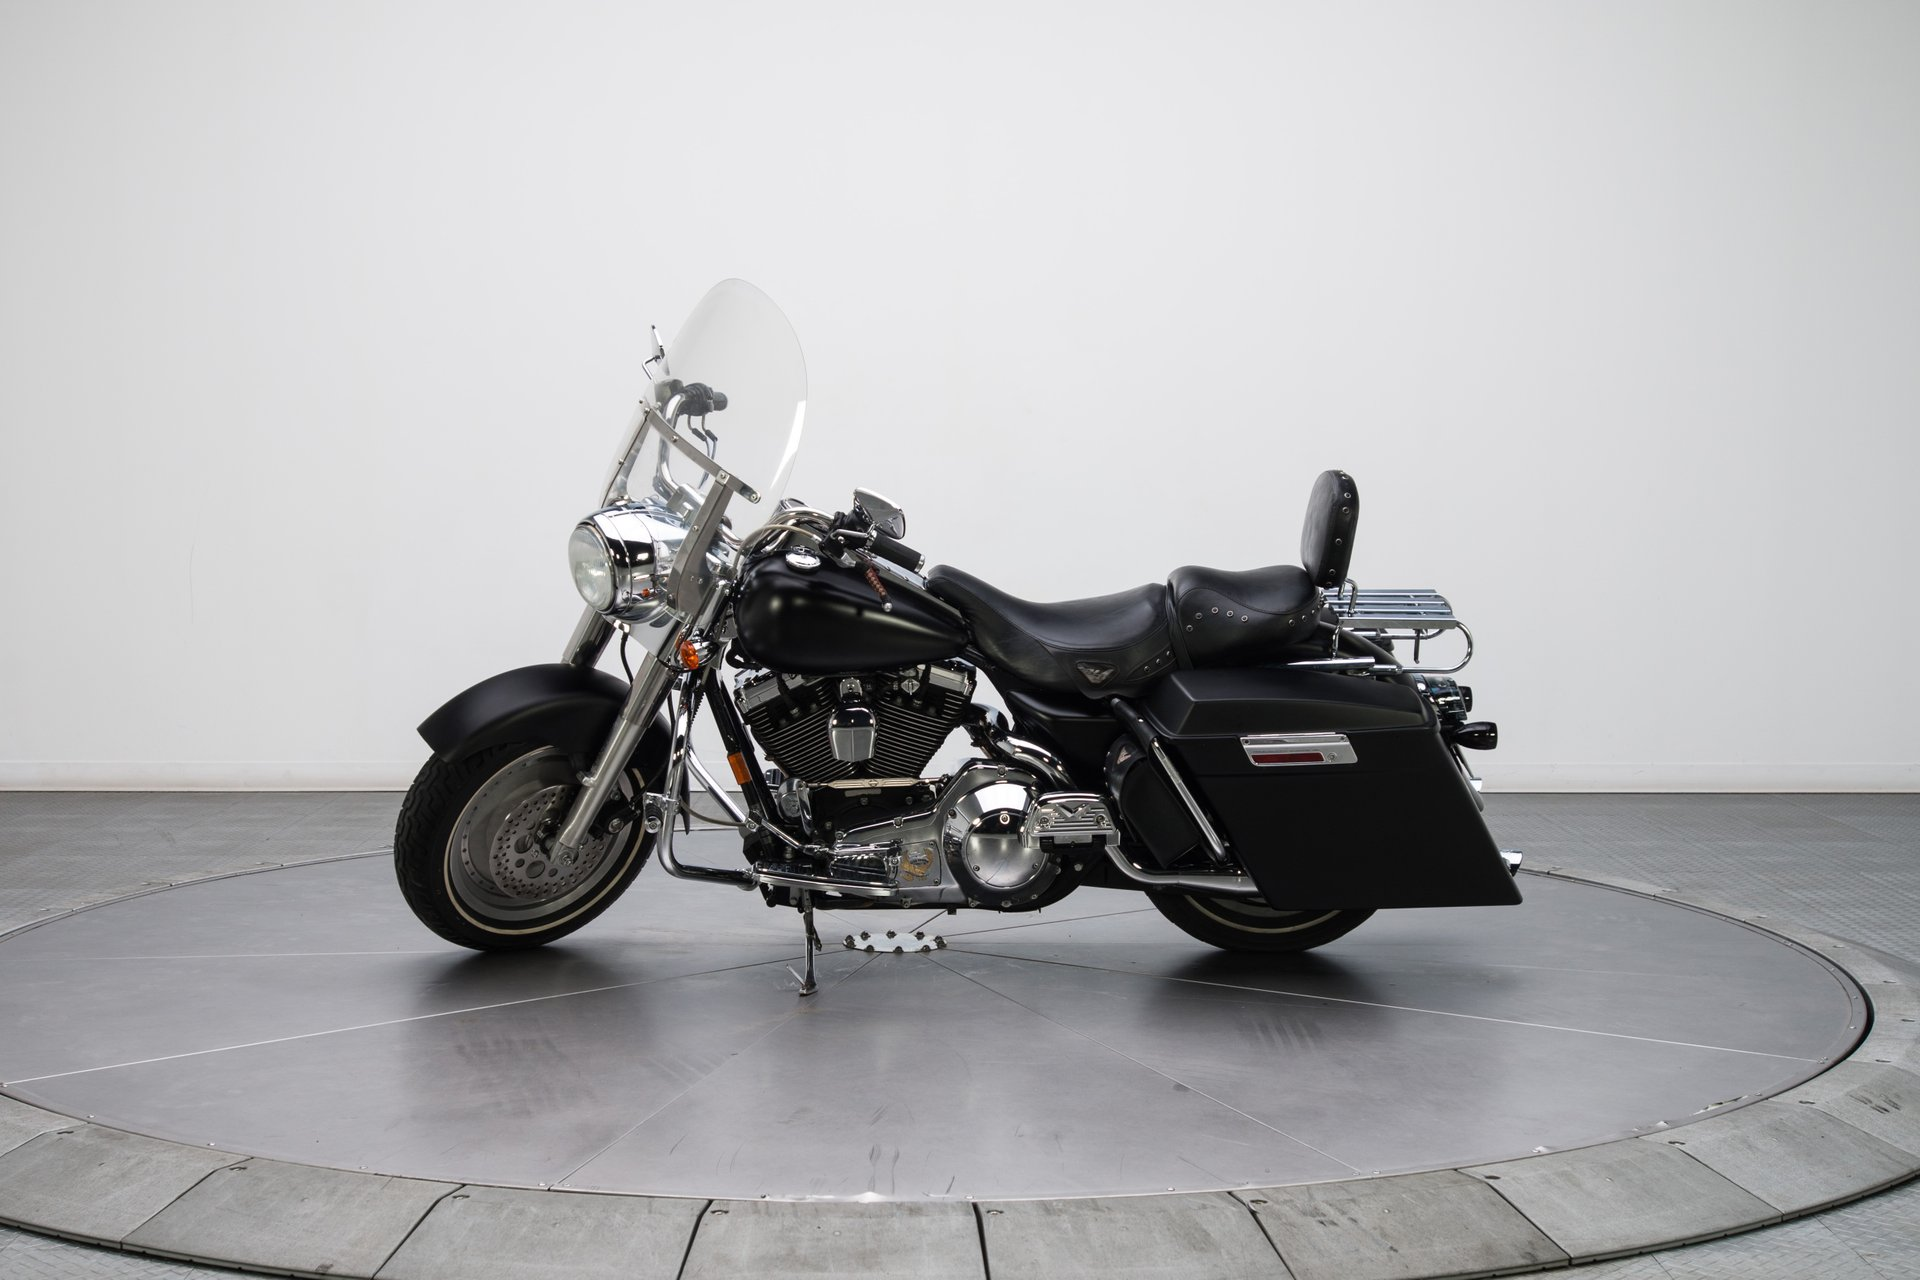 135106 1996 Harley Davidson FLHR RK Motors Classic Cars for Sale